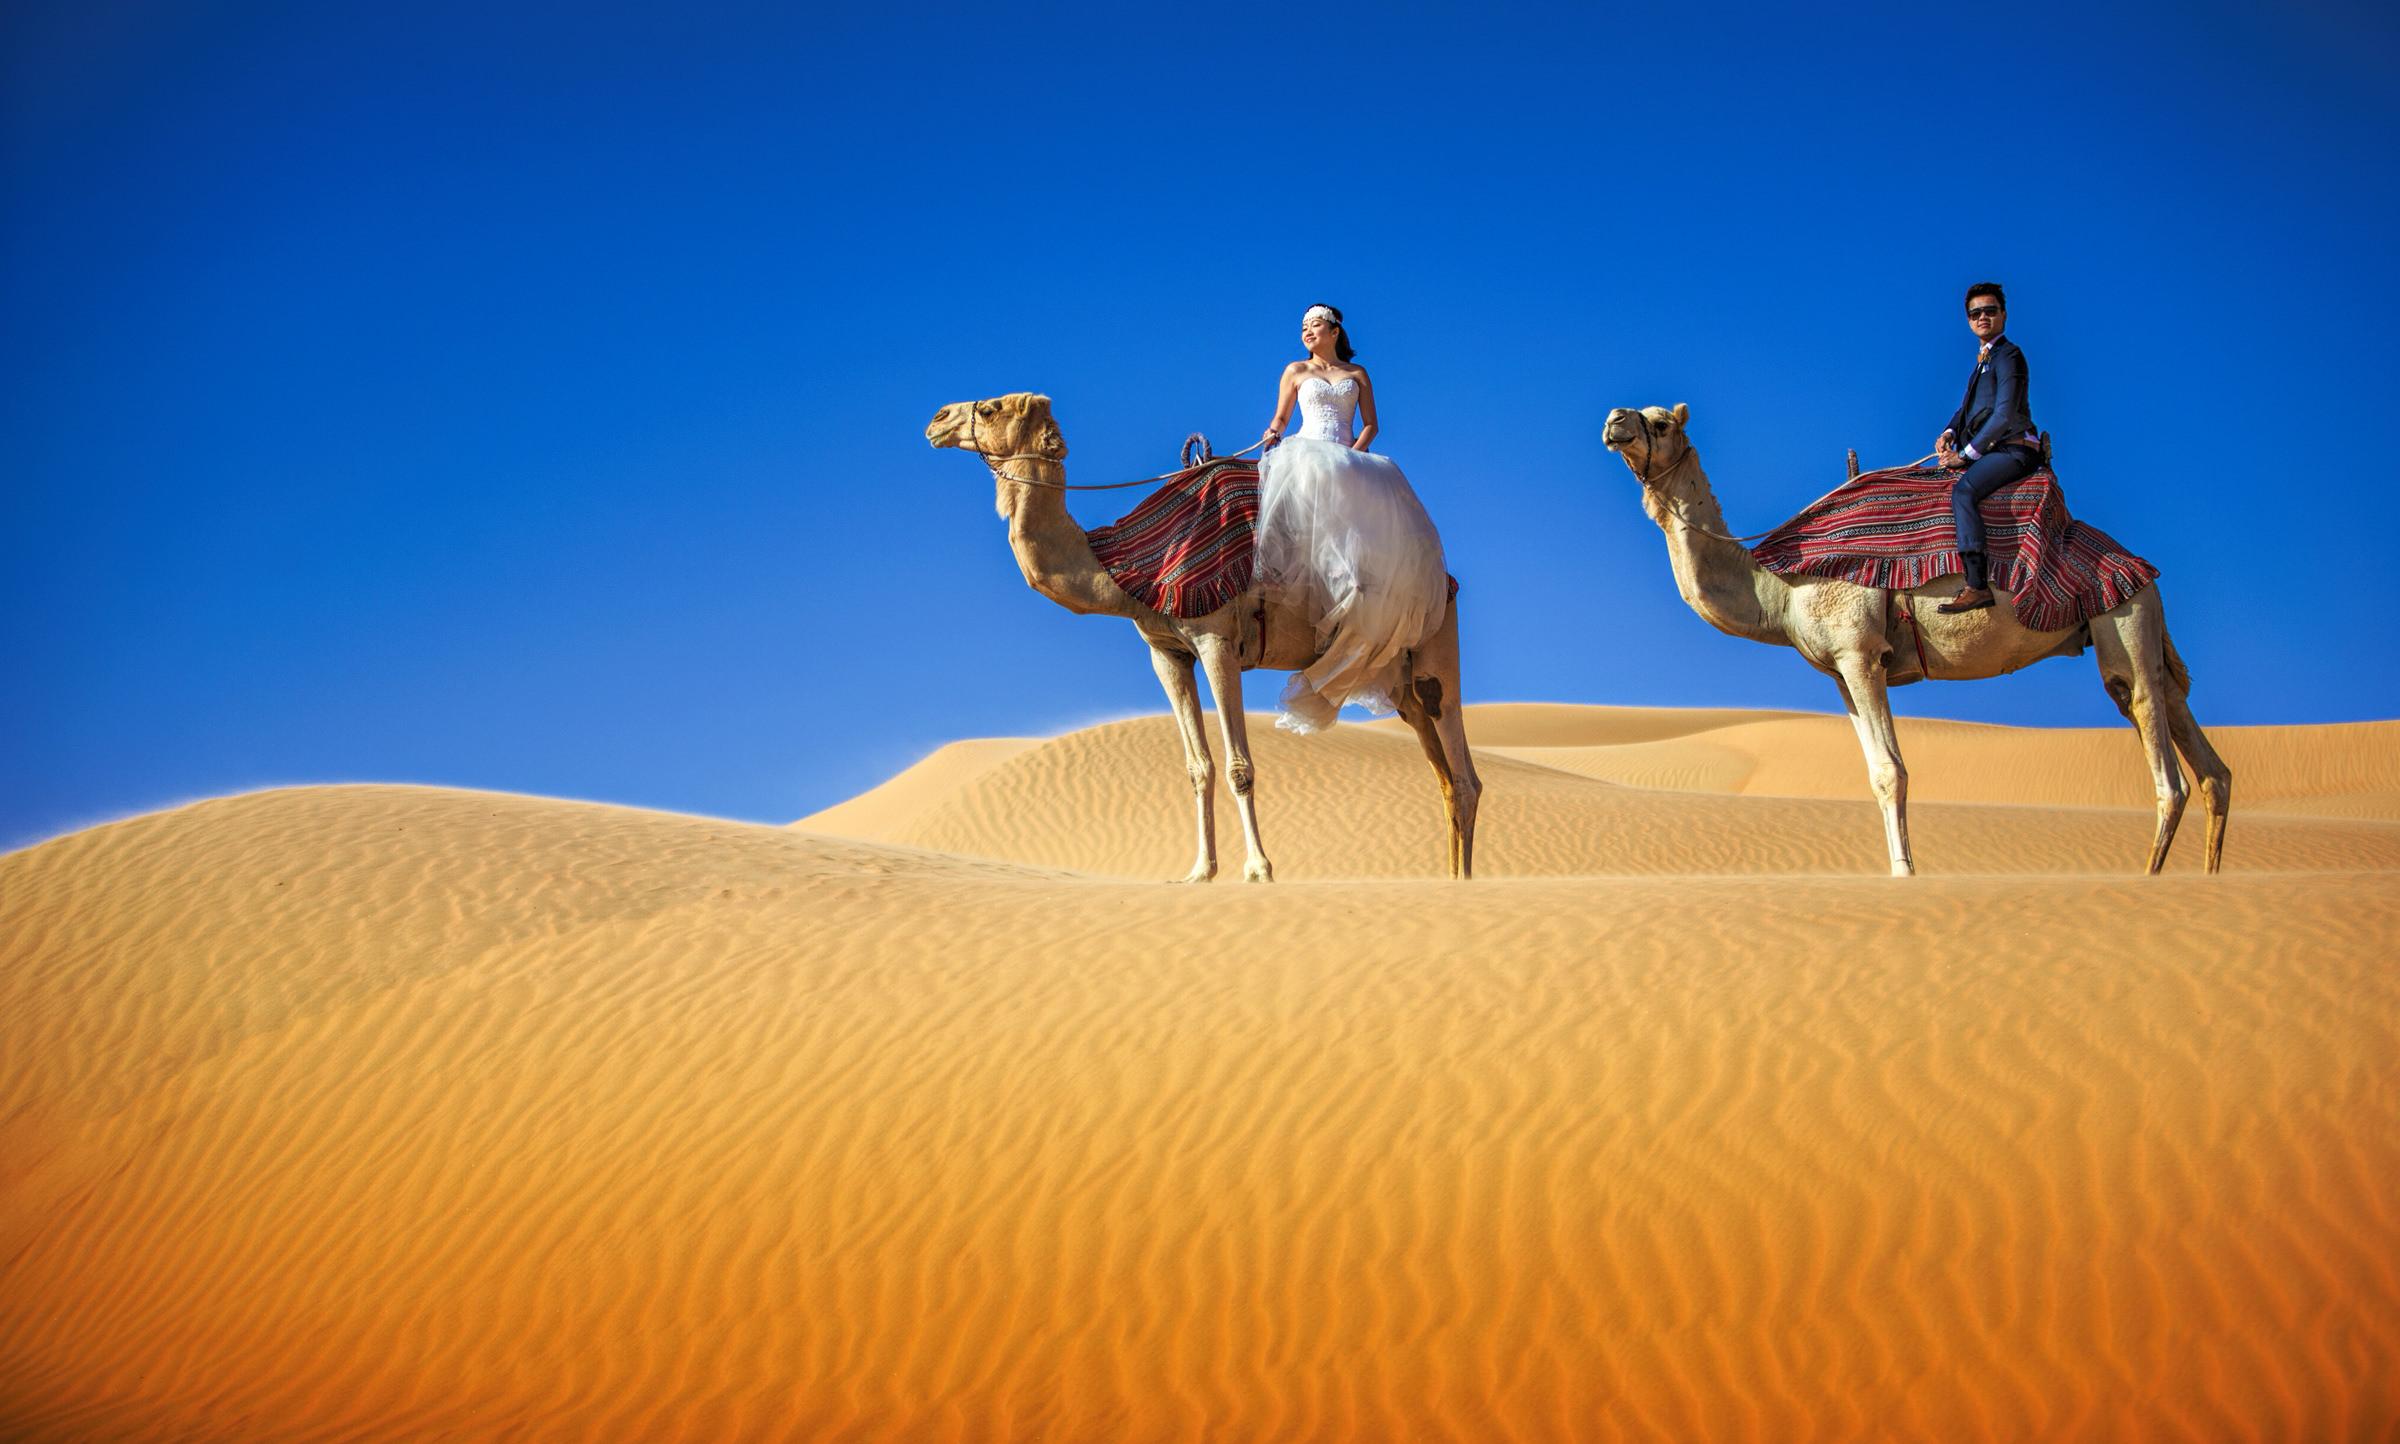 couple-on-camels-dubai-edwin-tan-photography